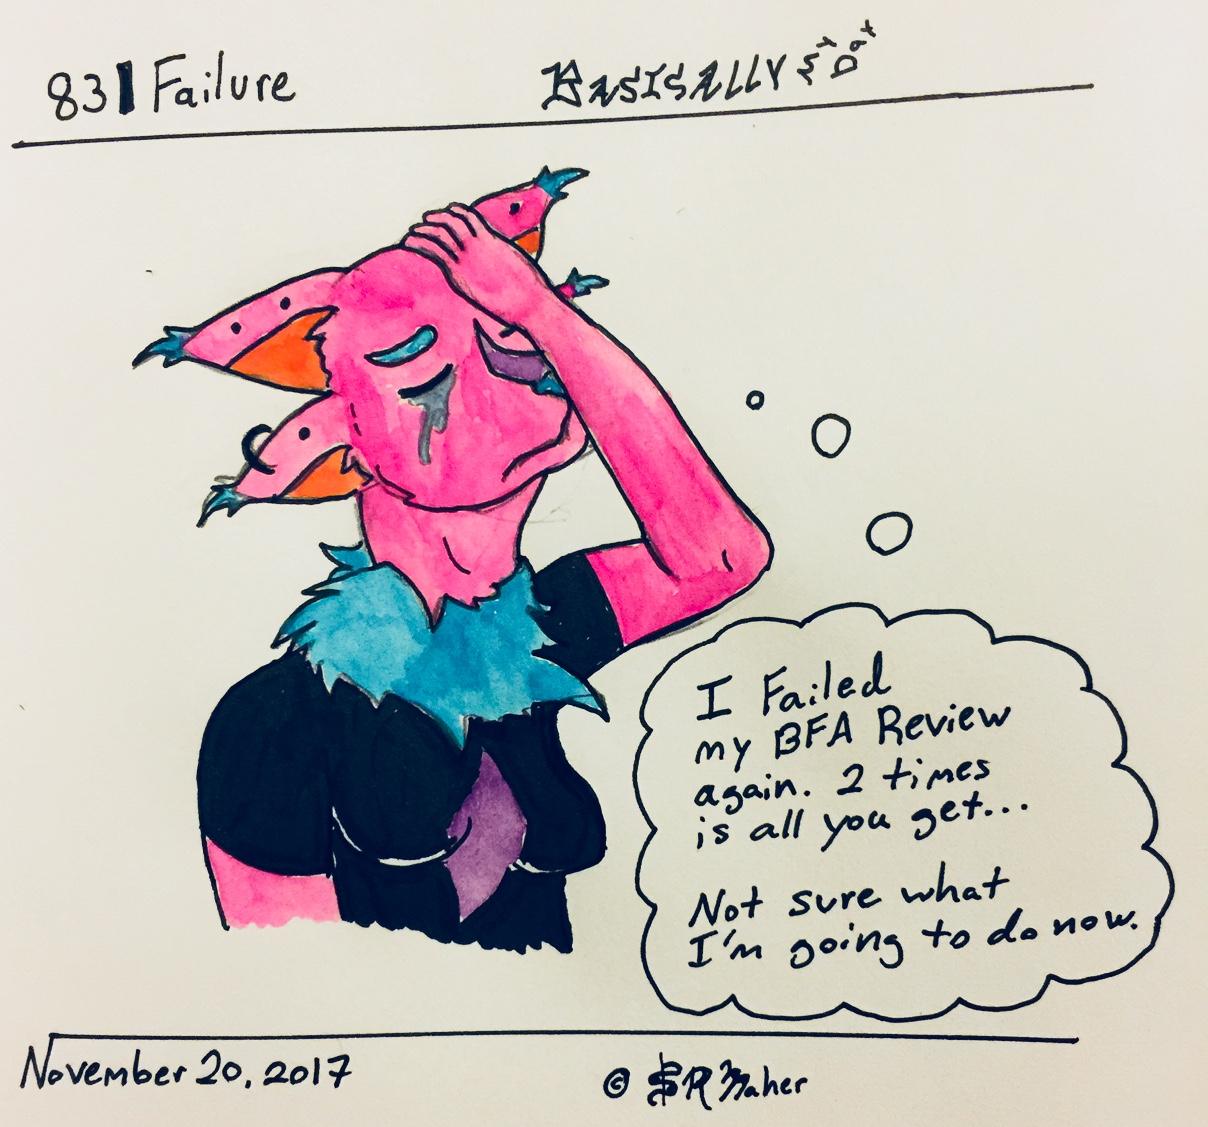 83 | Failure